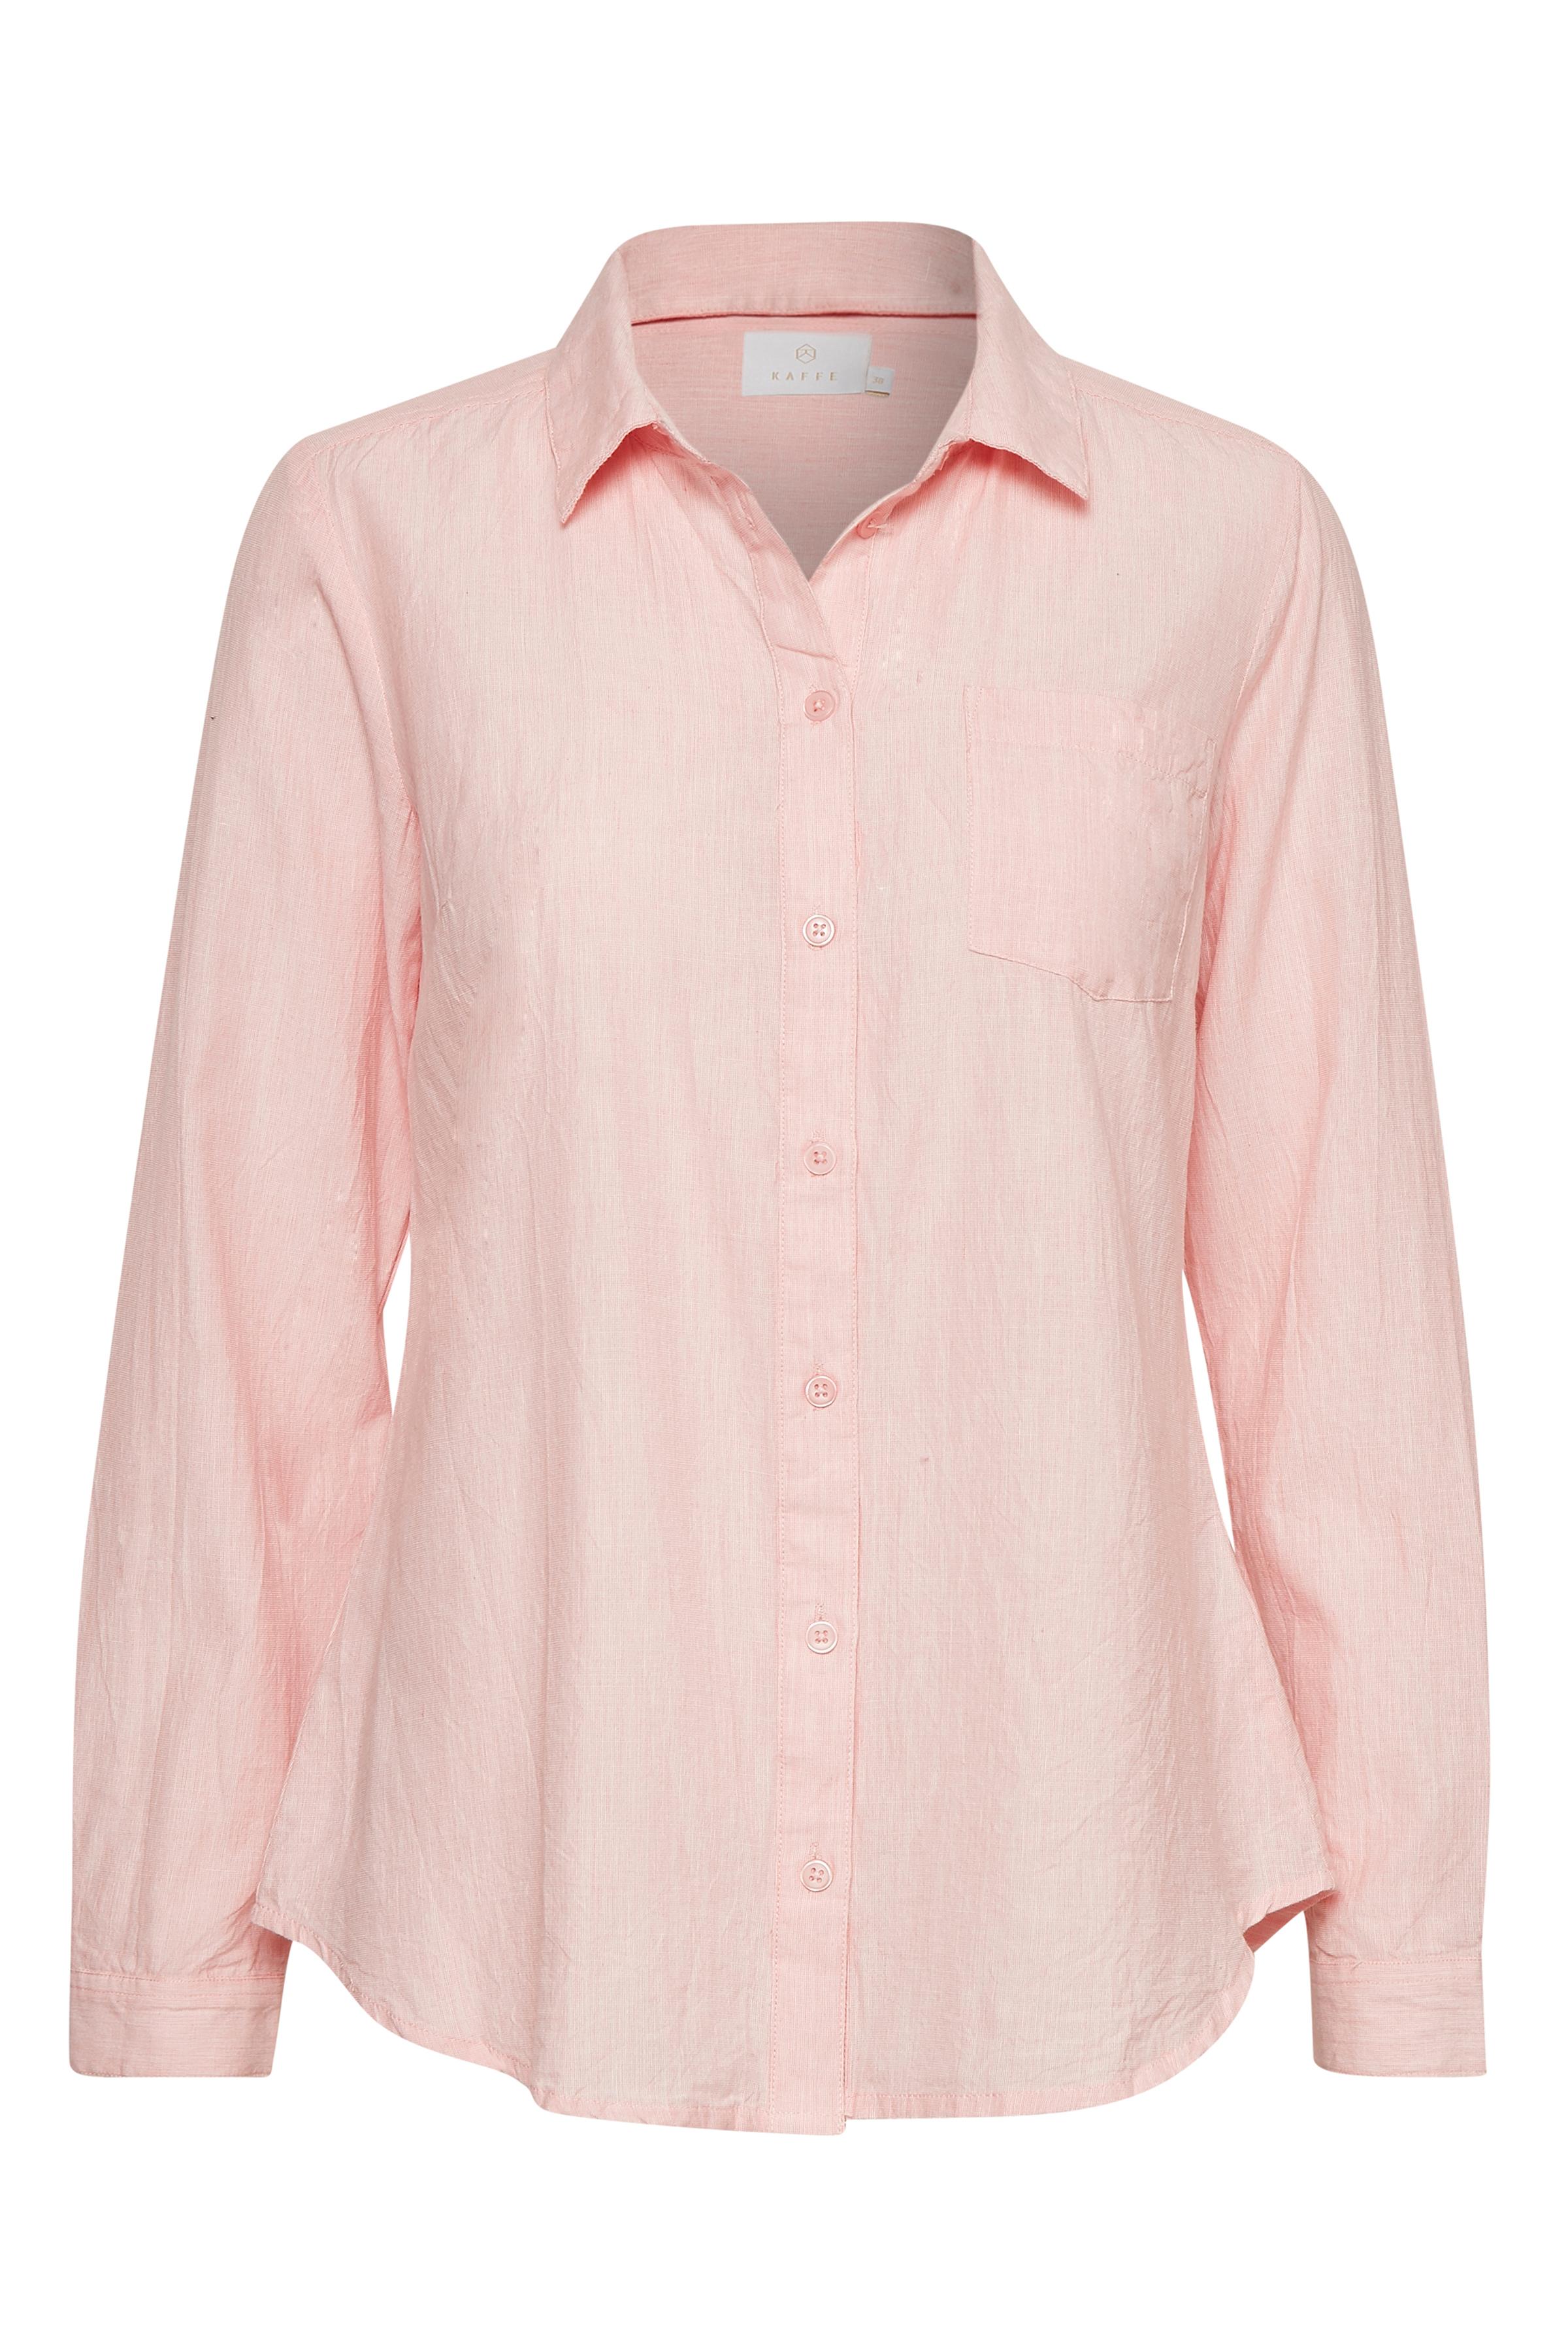 Image of Kaffe Dame Langærmet skjorte - Lys rosa